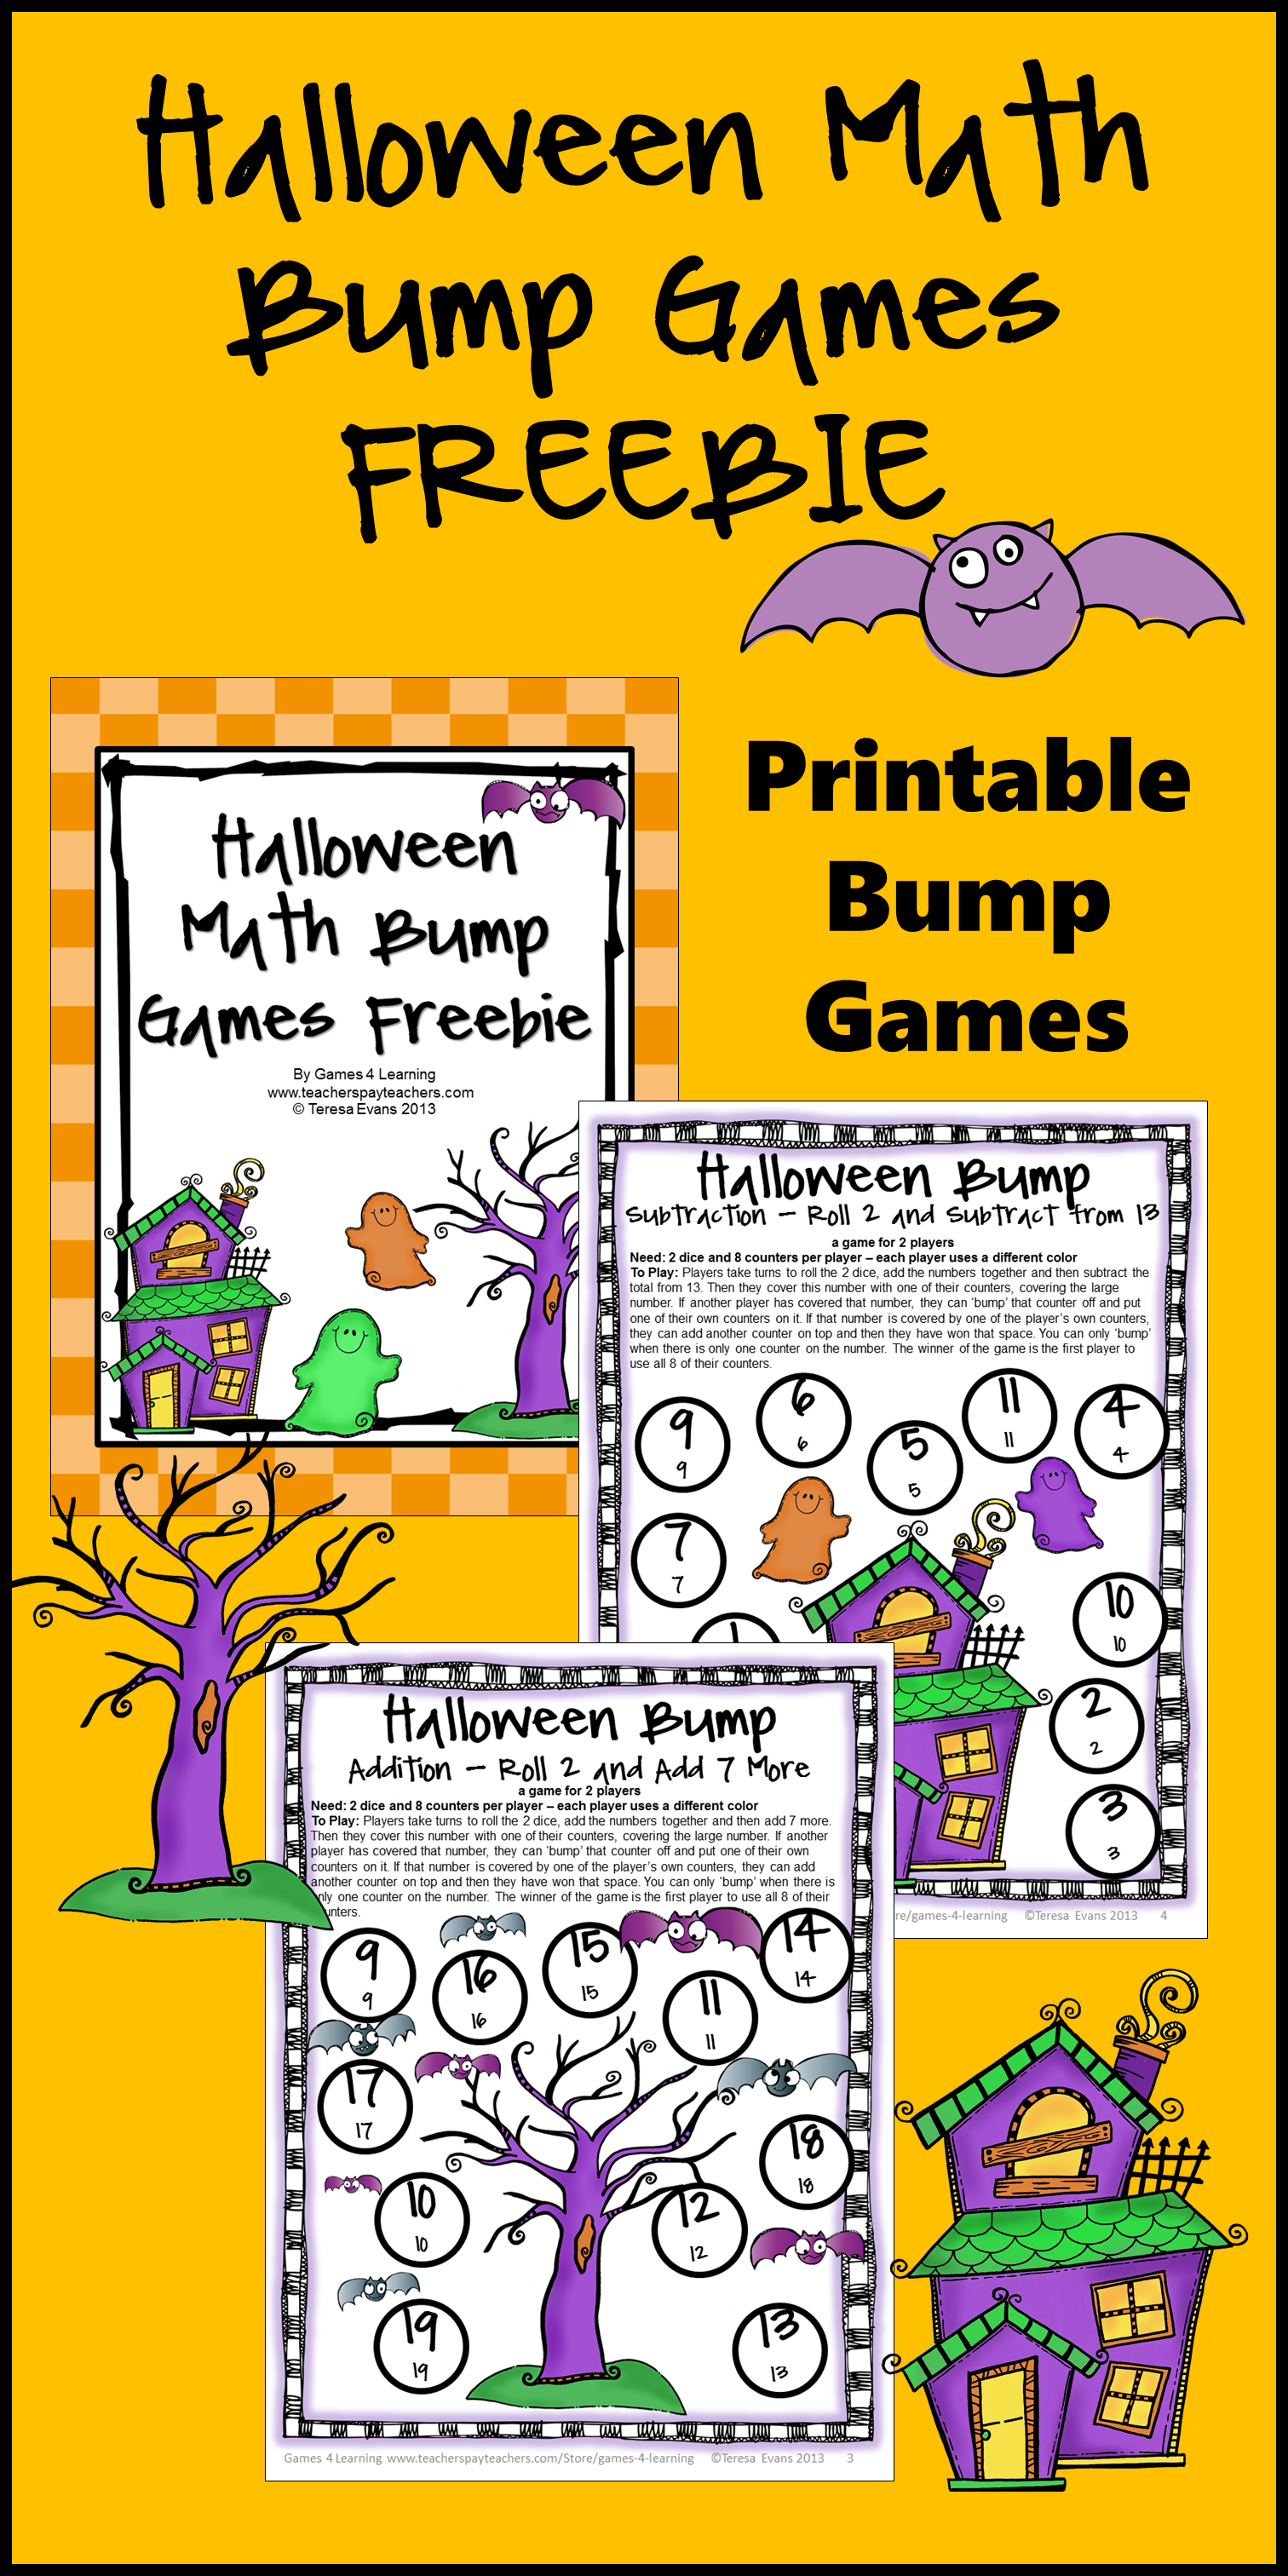 Halloween Free Math Games Fun Halloween Math Activities